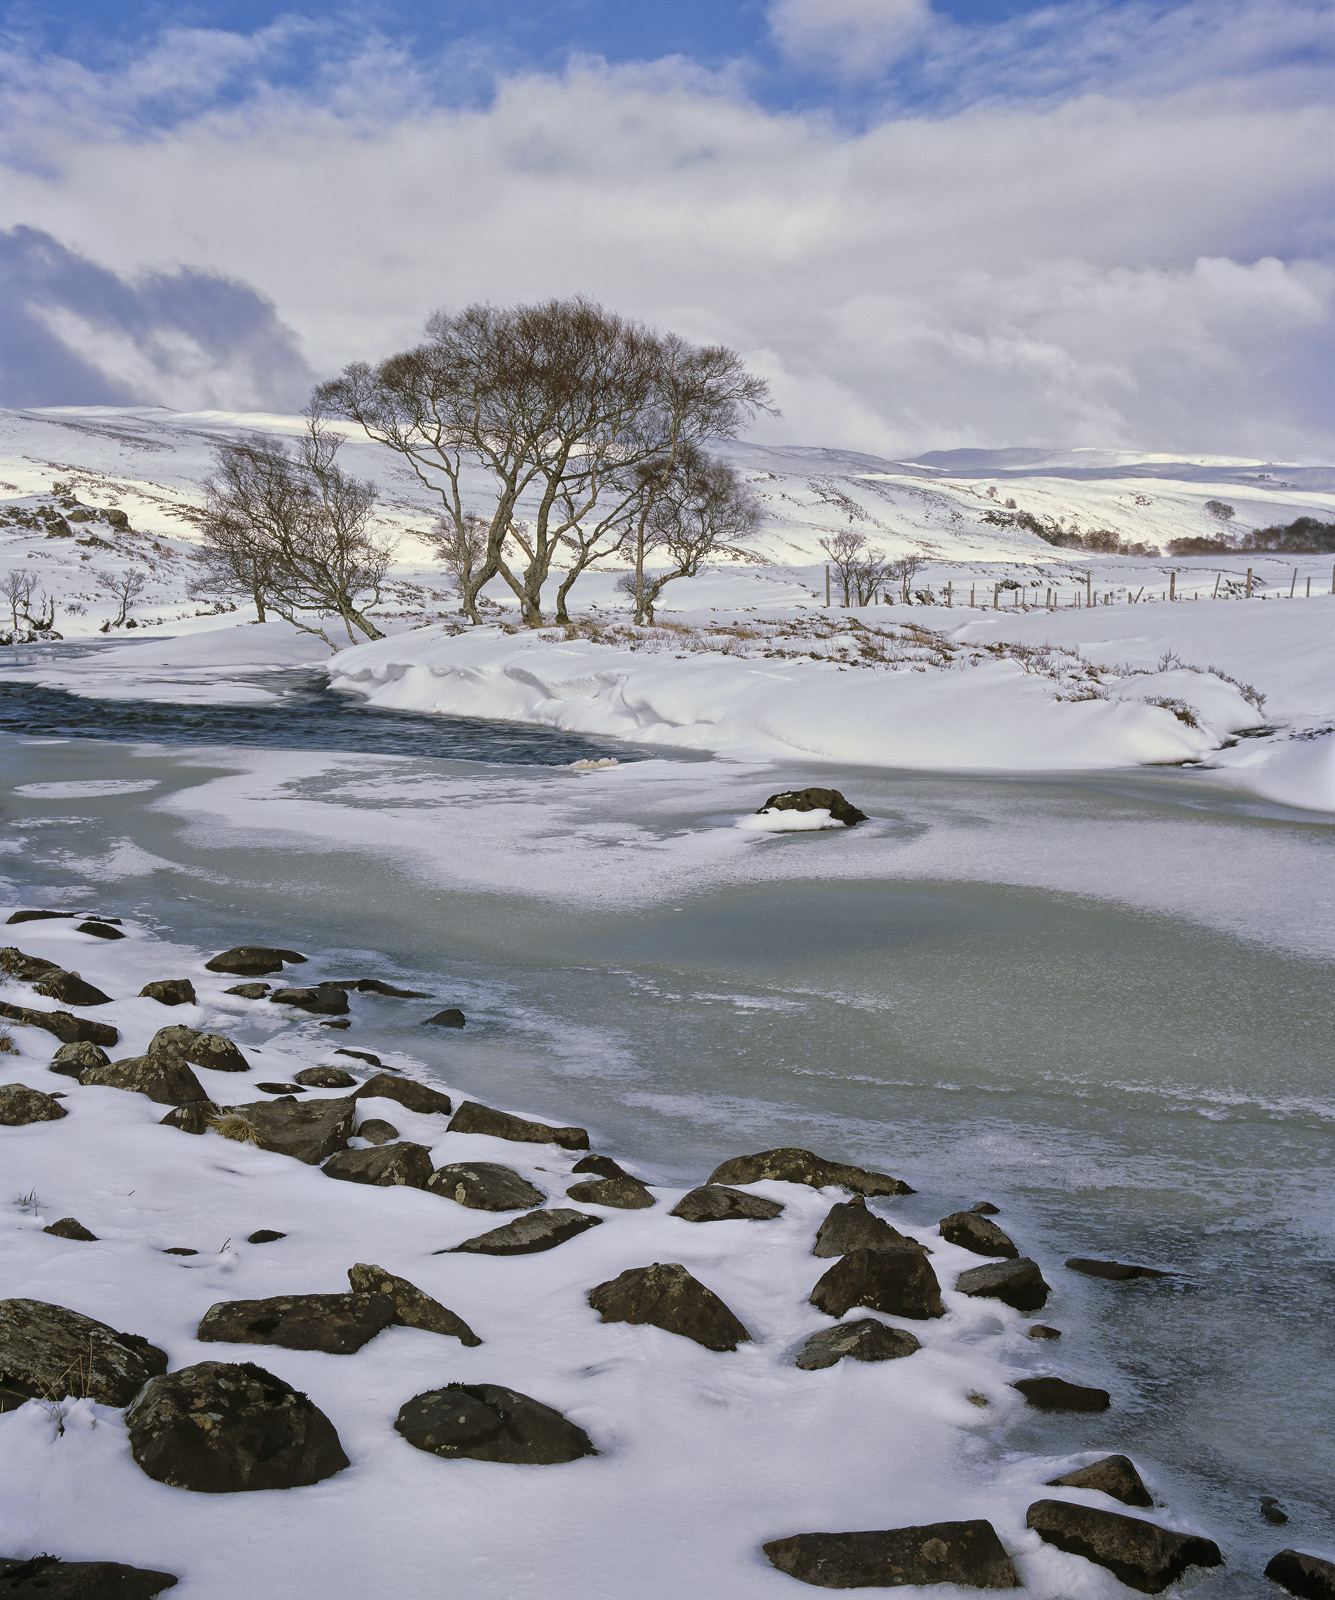 Winter Course Rhidarroch, Rhidarroch, Inverpolly, Scotland, winter, snow, river, bend, loch, drains, light, wonderland, , photo